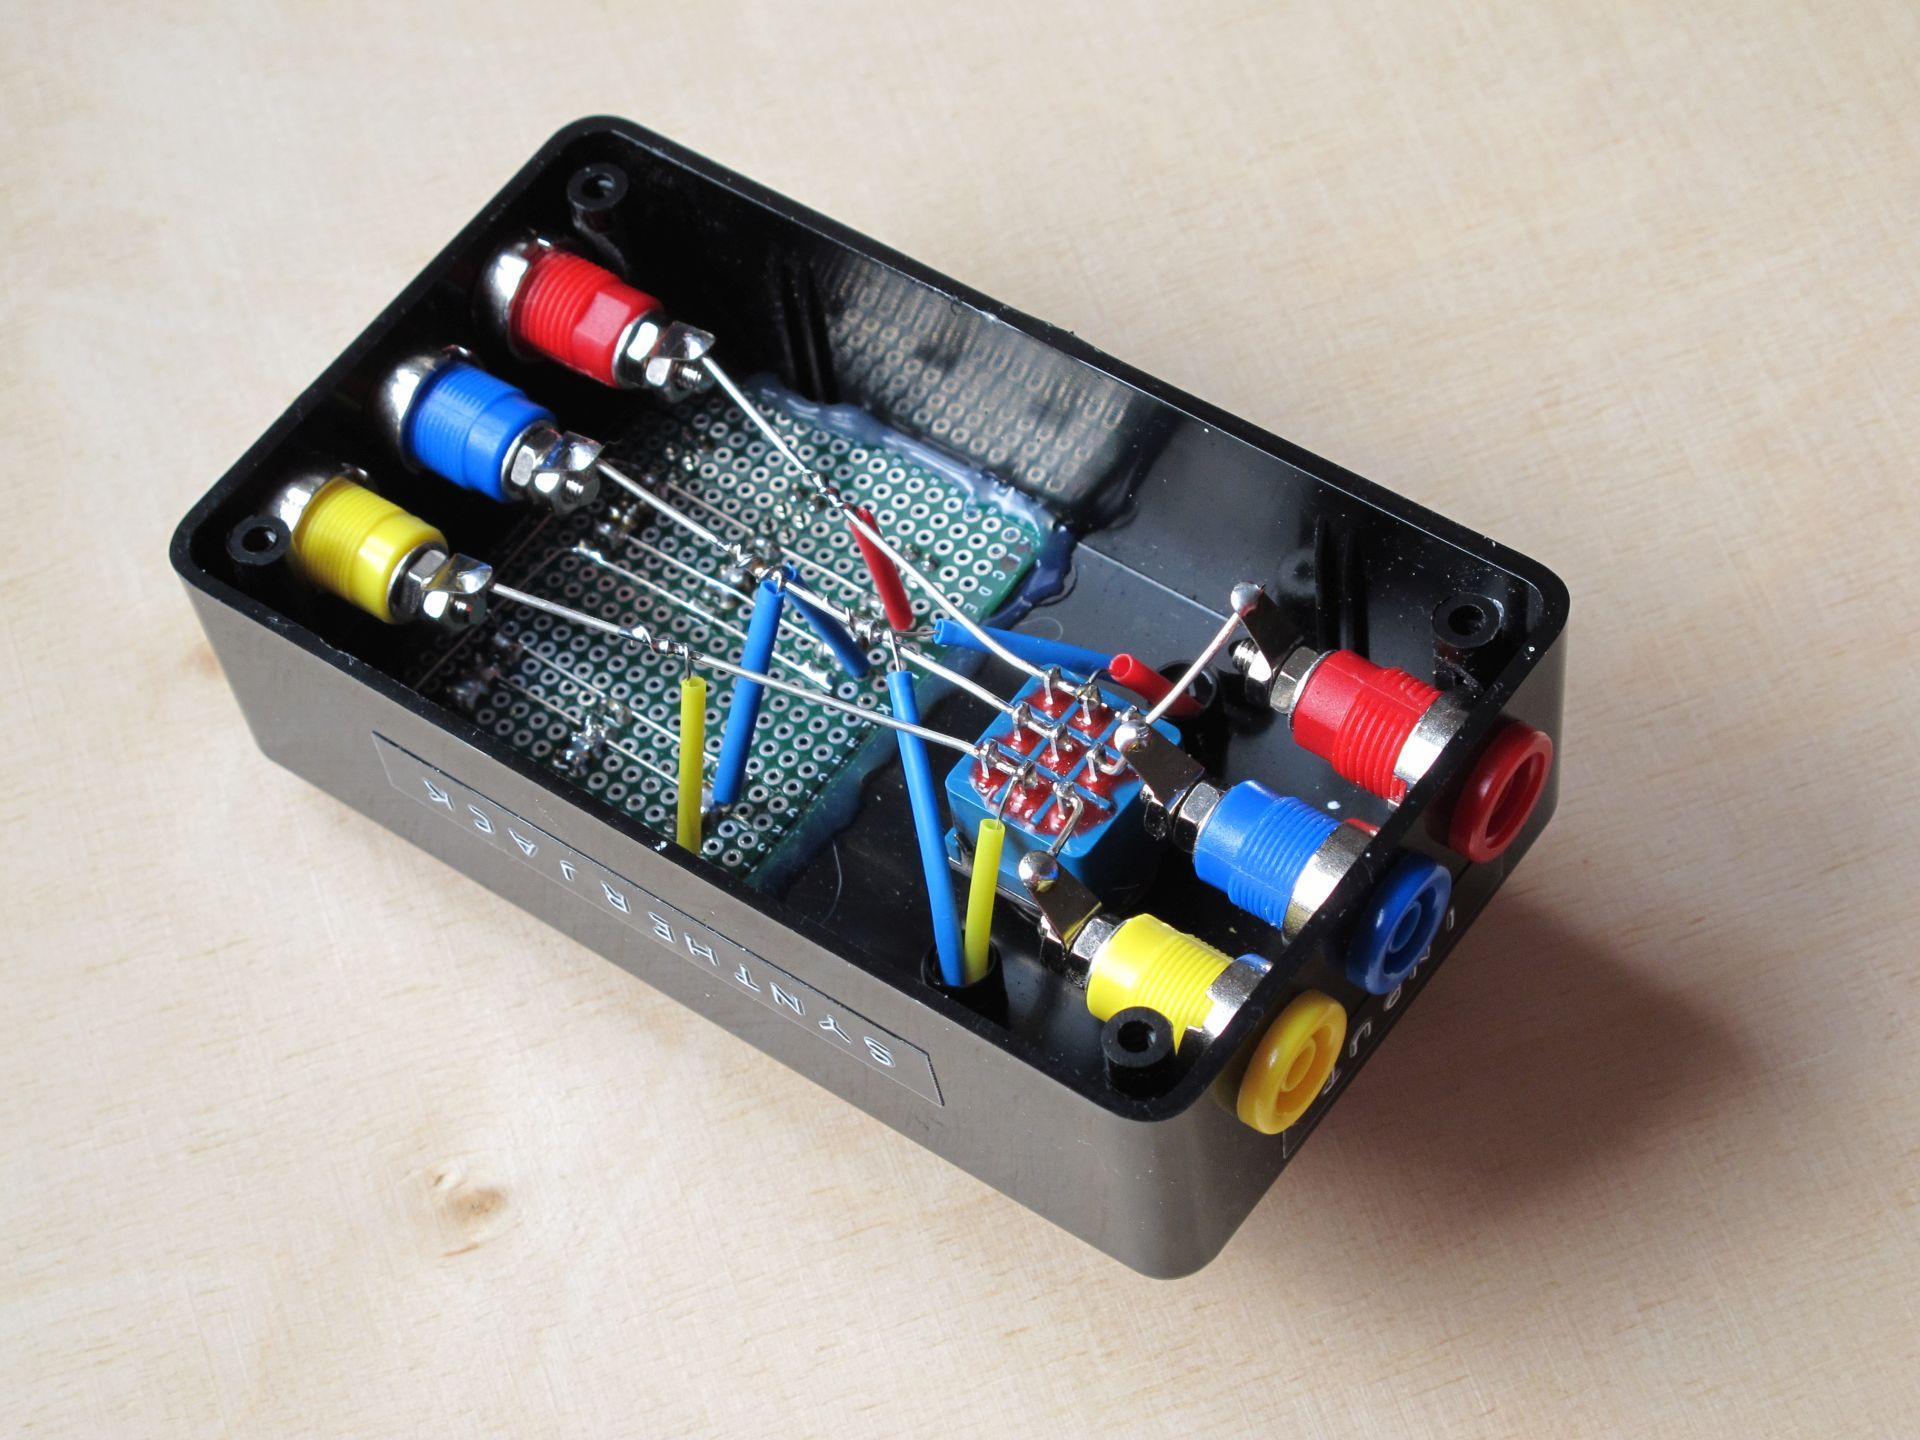 Device internals